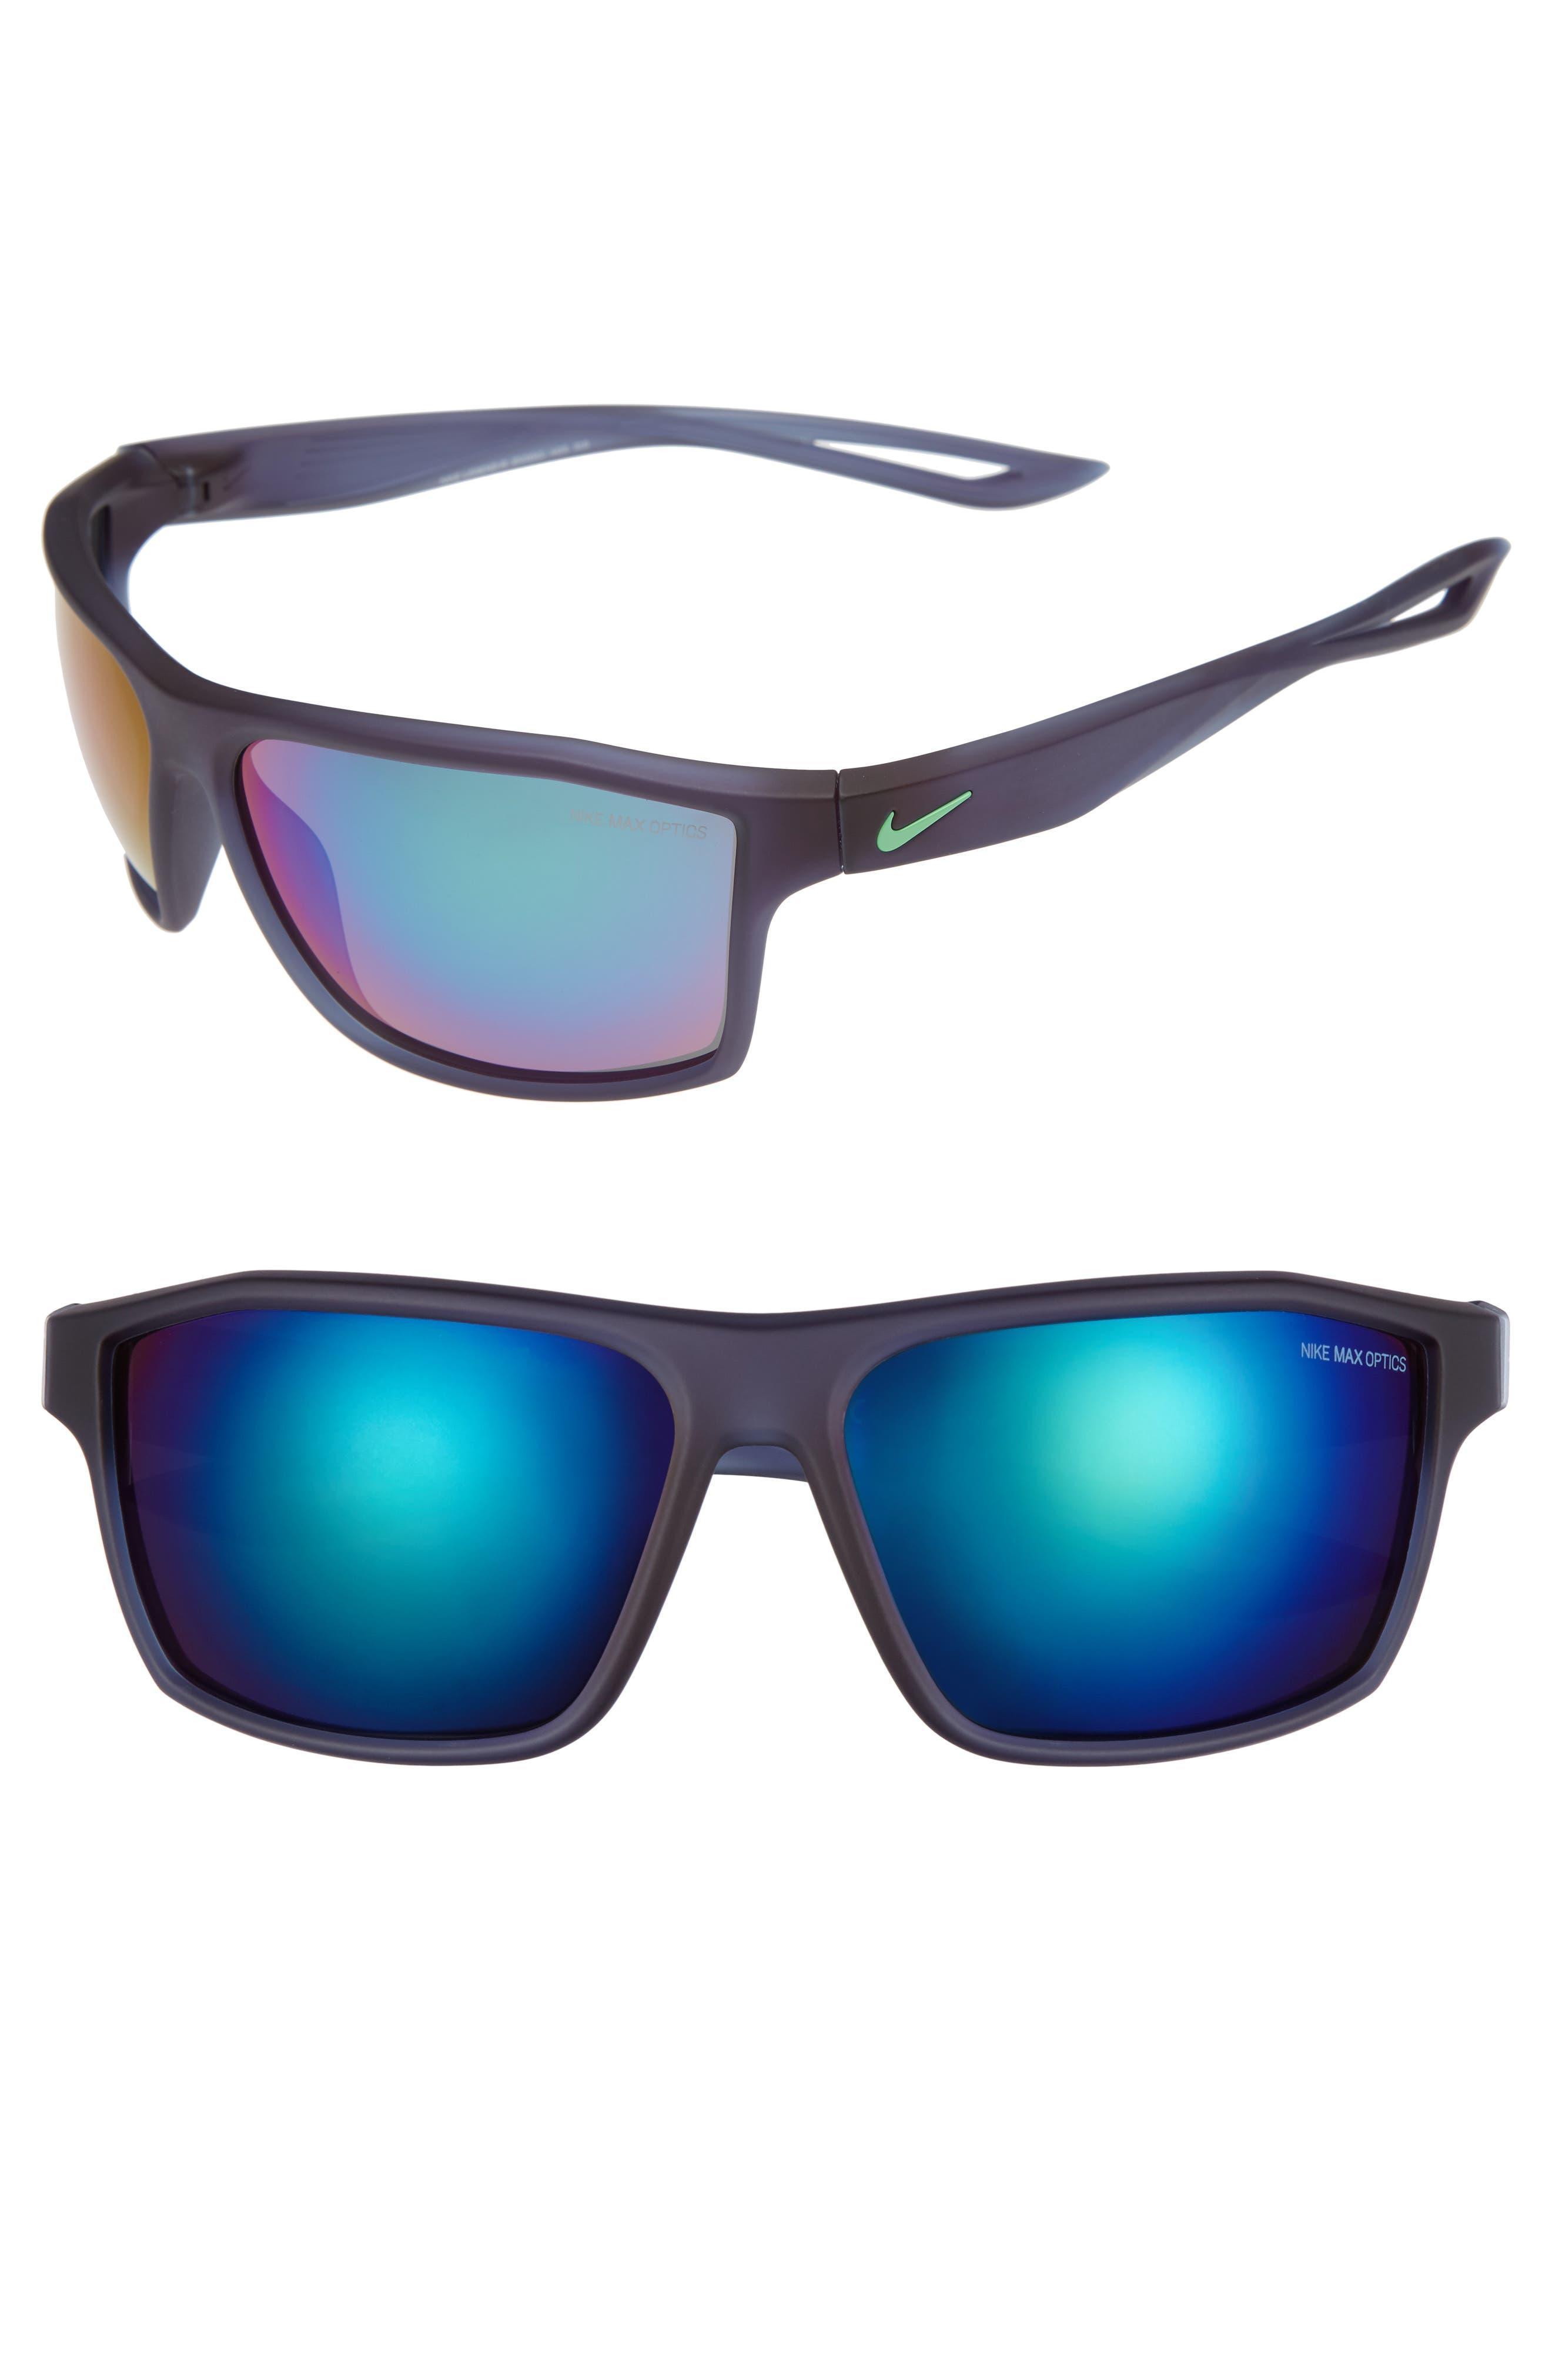 Legend 65mm Mirrored Multi-Sport Sunglasses,                         Main,                         color, MATTE MIDNIGHT NAVY